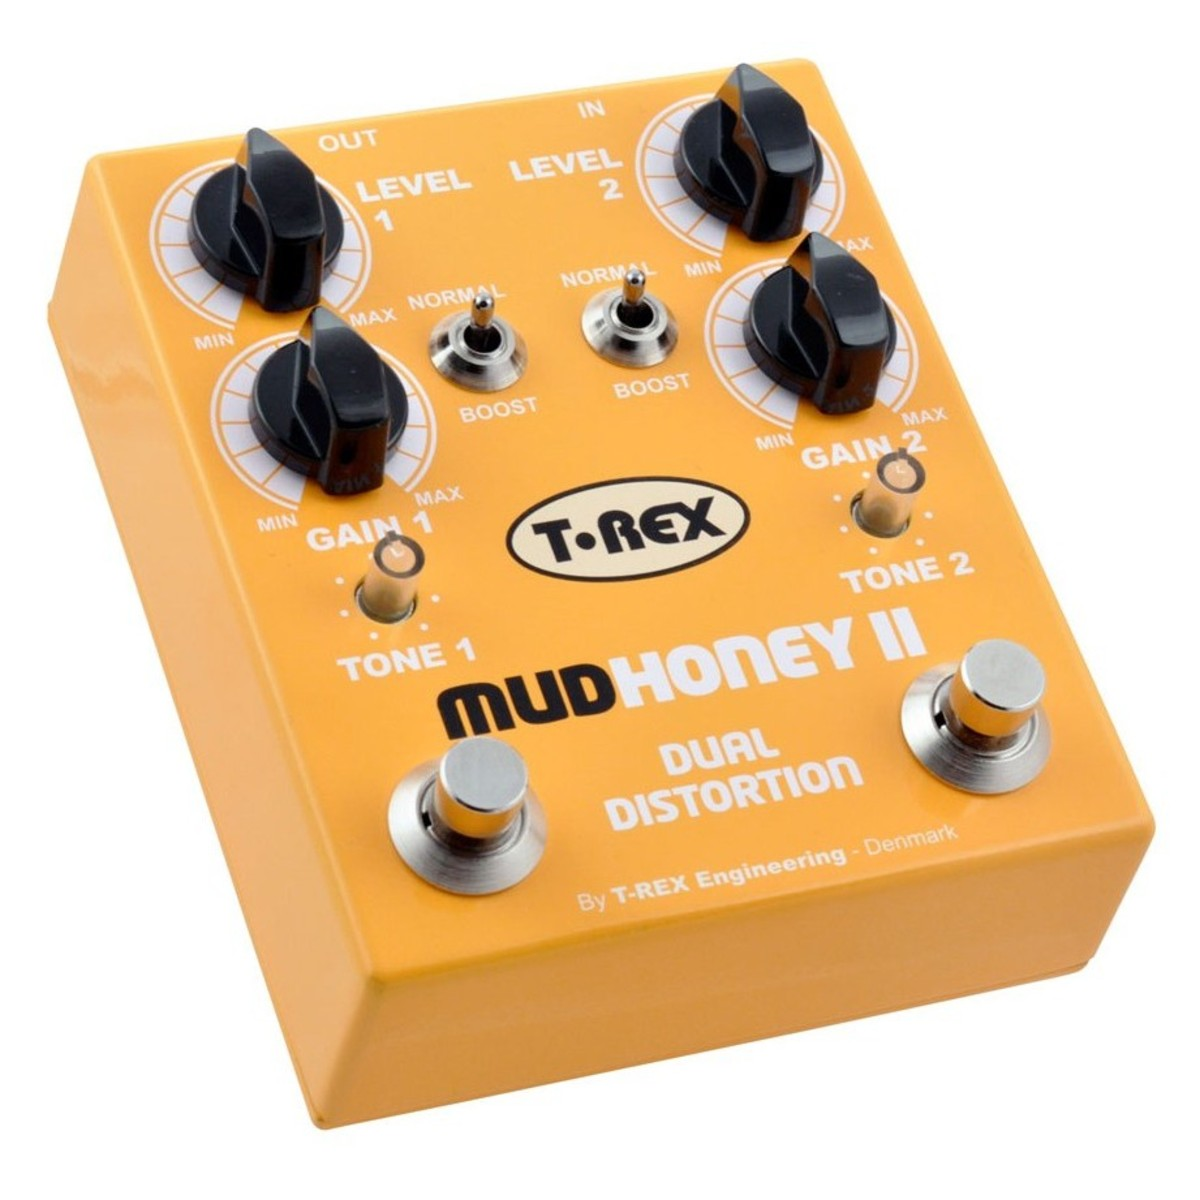 T-Rex Mudhoney 2